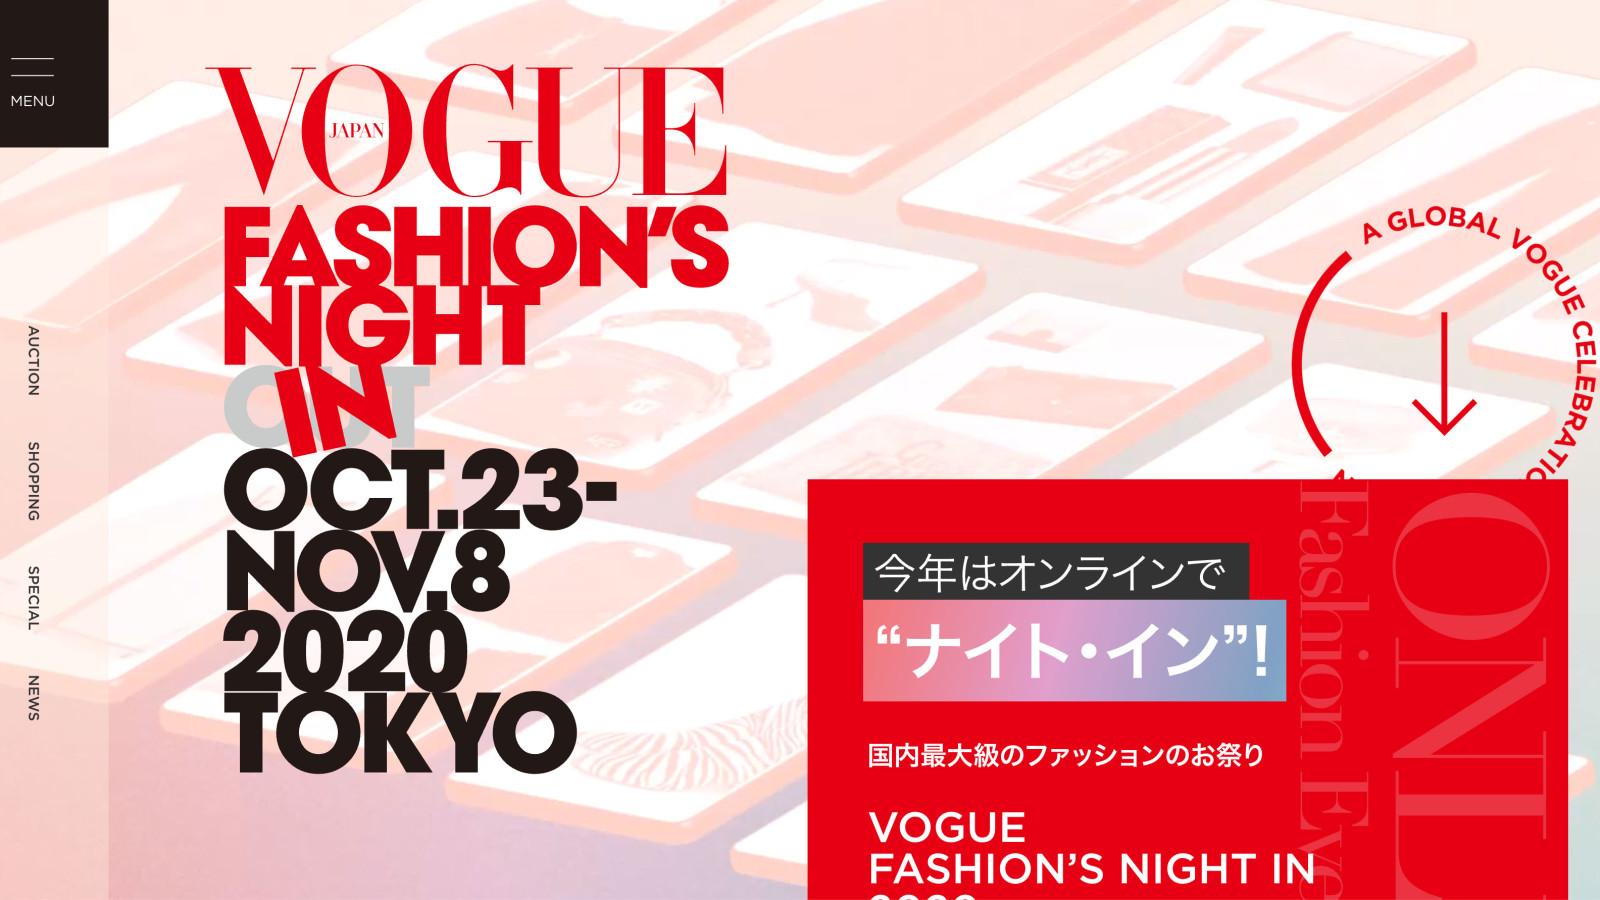 Screen-Shot-2021-03-25-at-5.38.05-PM-vogue-fashion-night-in-japan